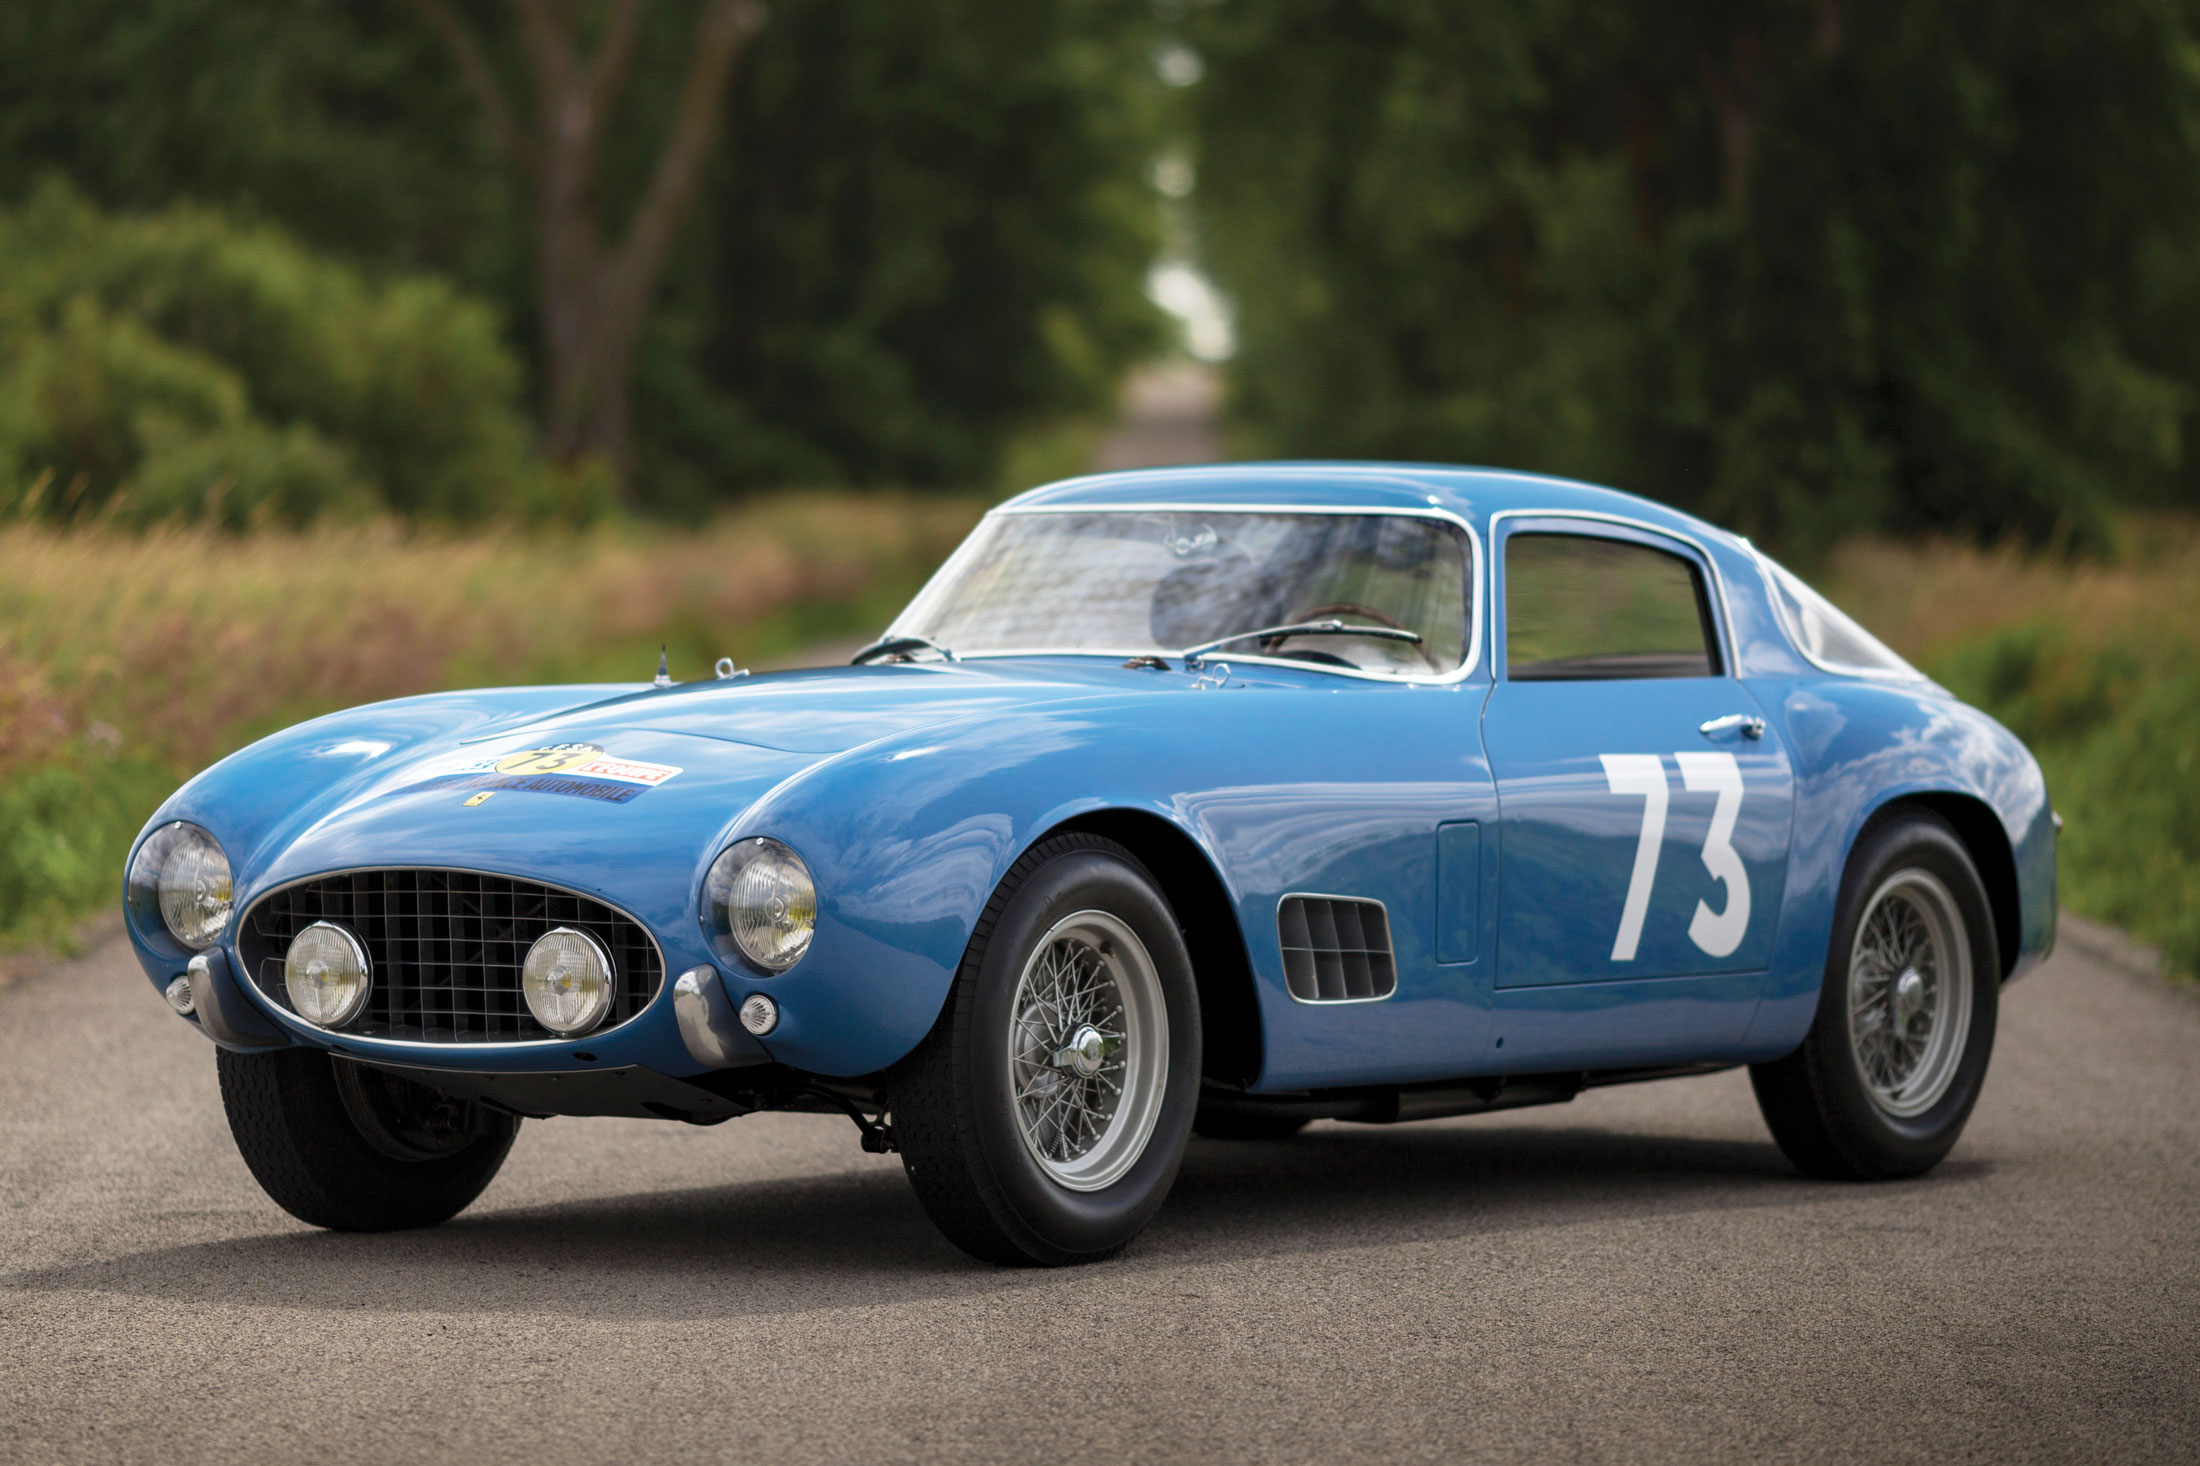 1956 Ferrari 250 GT Berlinetta Competizione 'Tour de France' | RM Sotheby's | Estimate: TBD